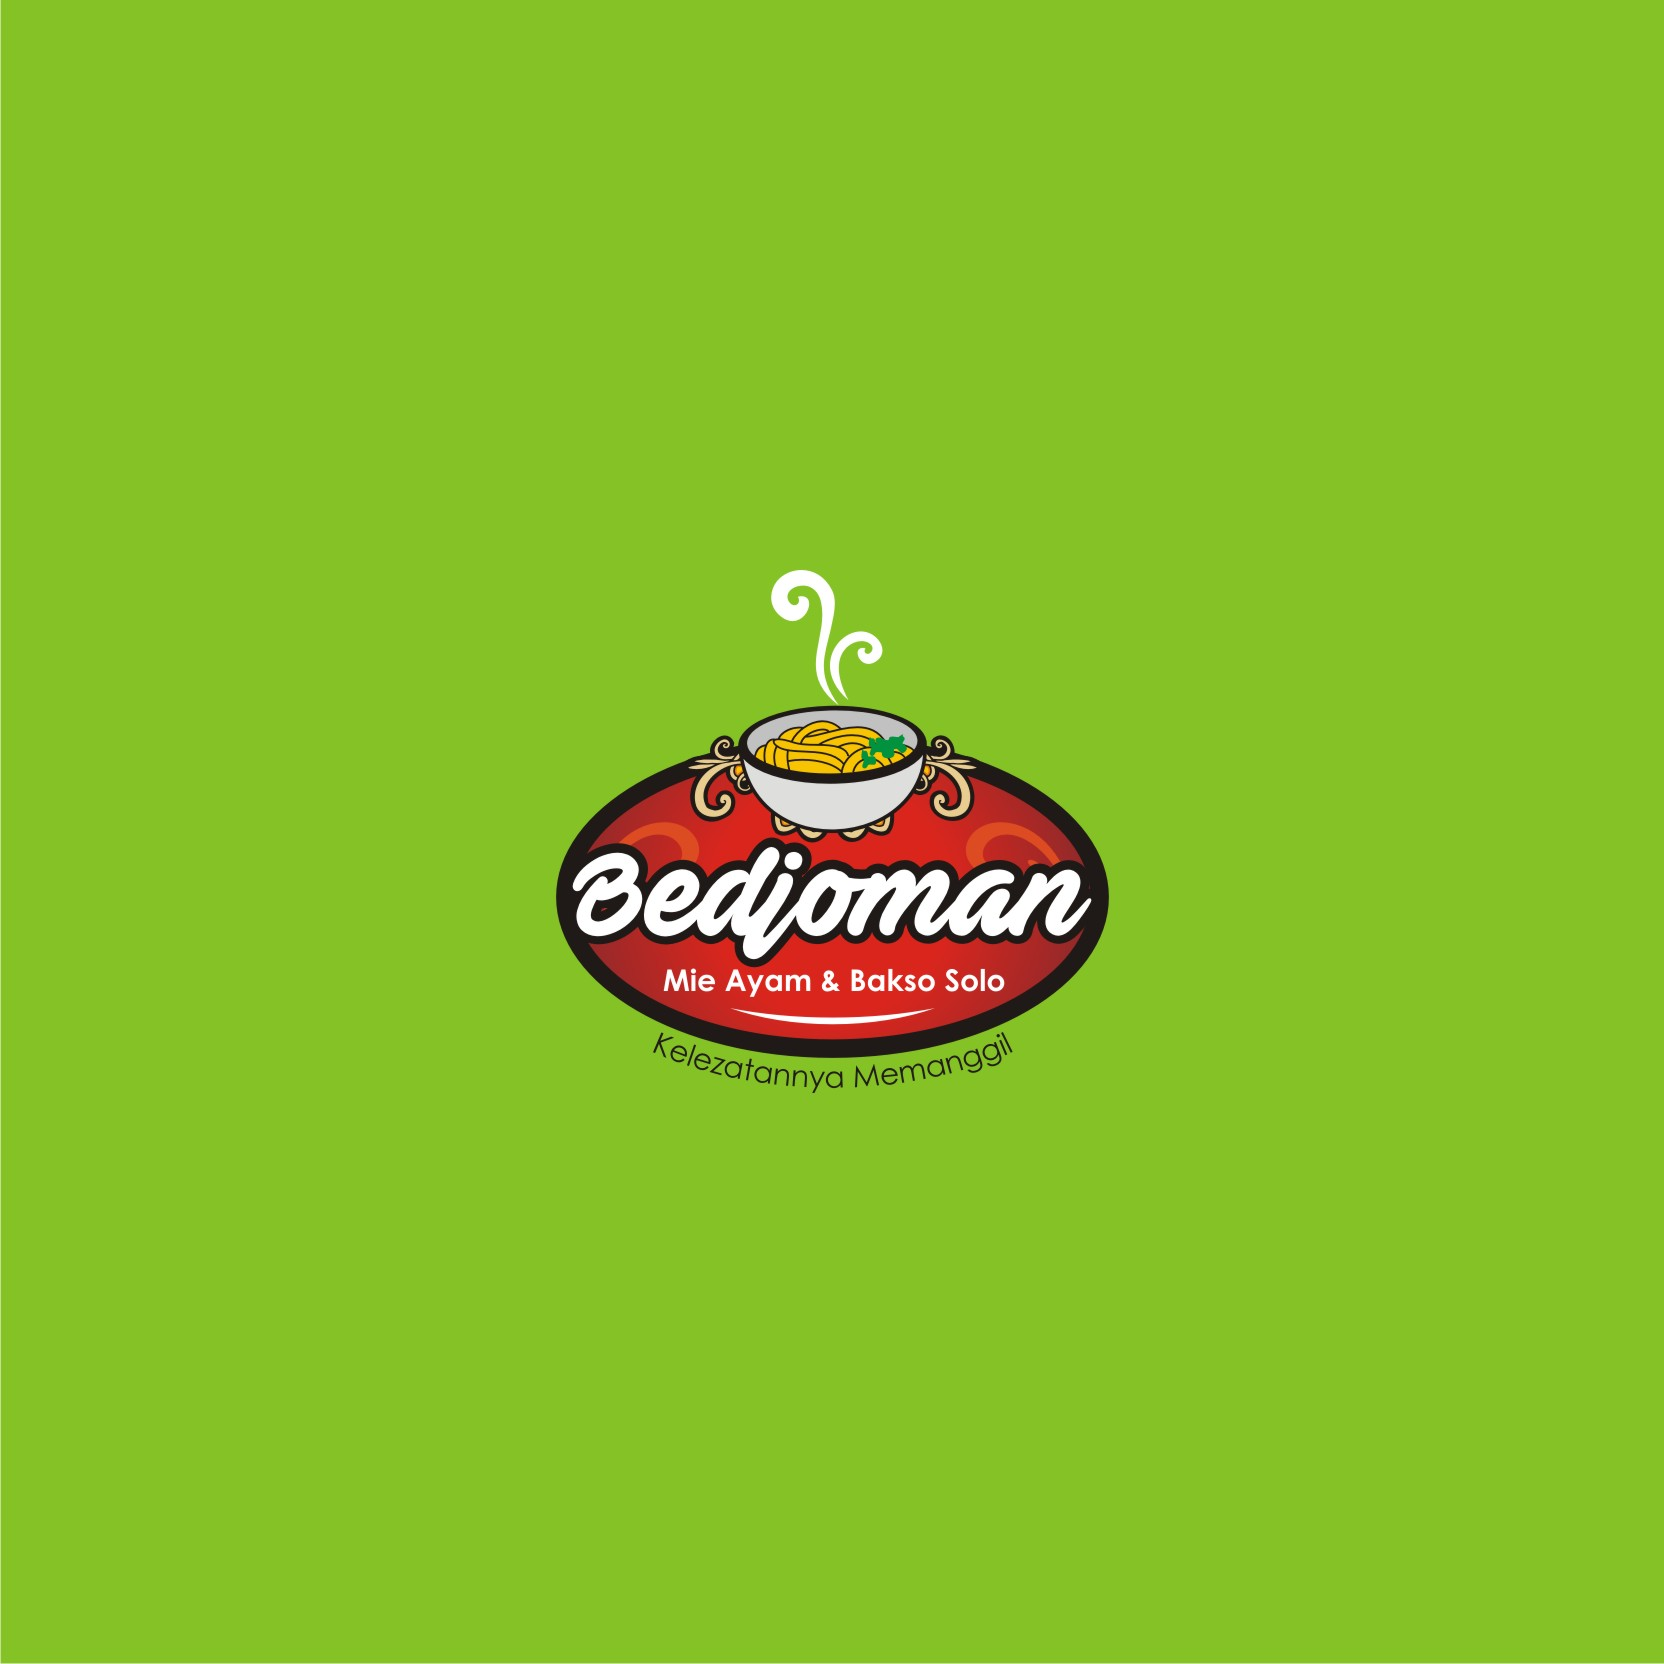 Sribu Desain Logo Logo Design Untuk Warung Mie Ayam Bak